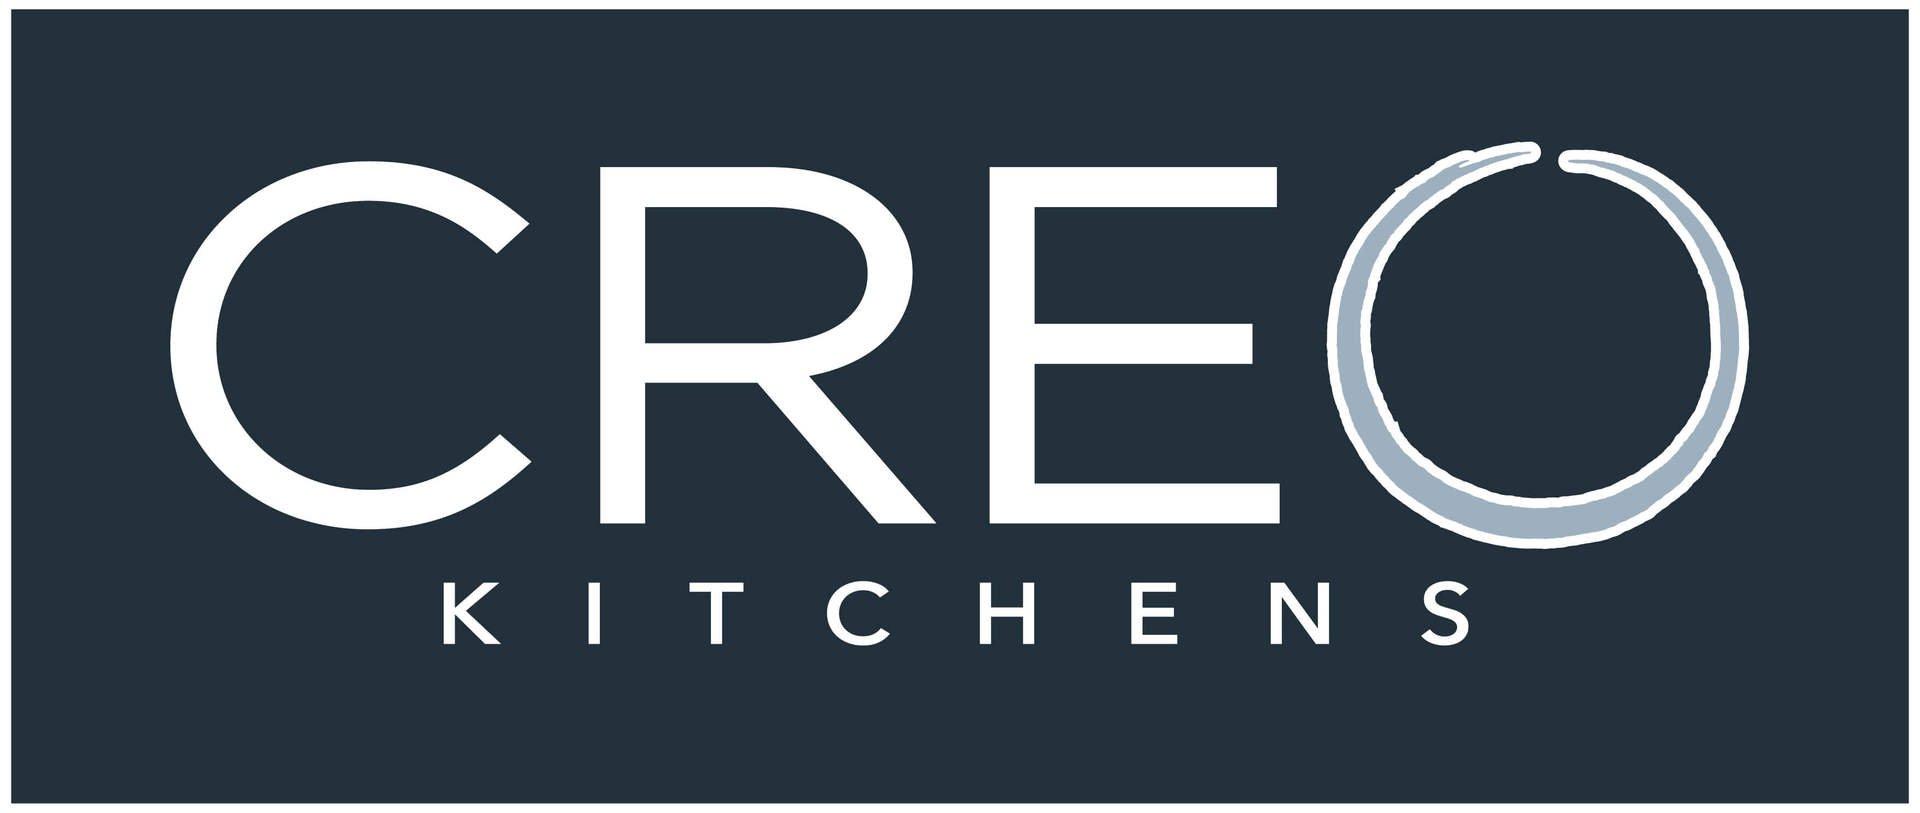 CREO Kitchens logo